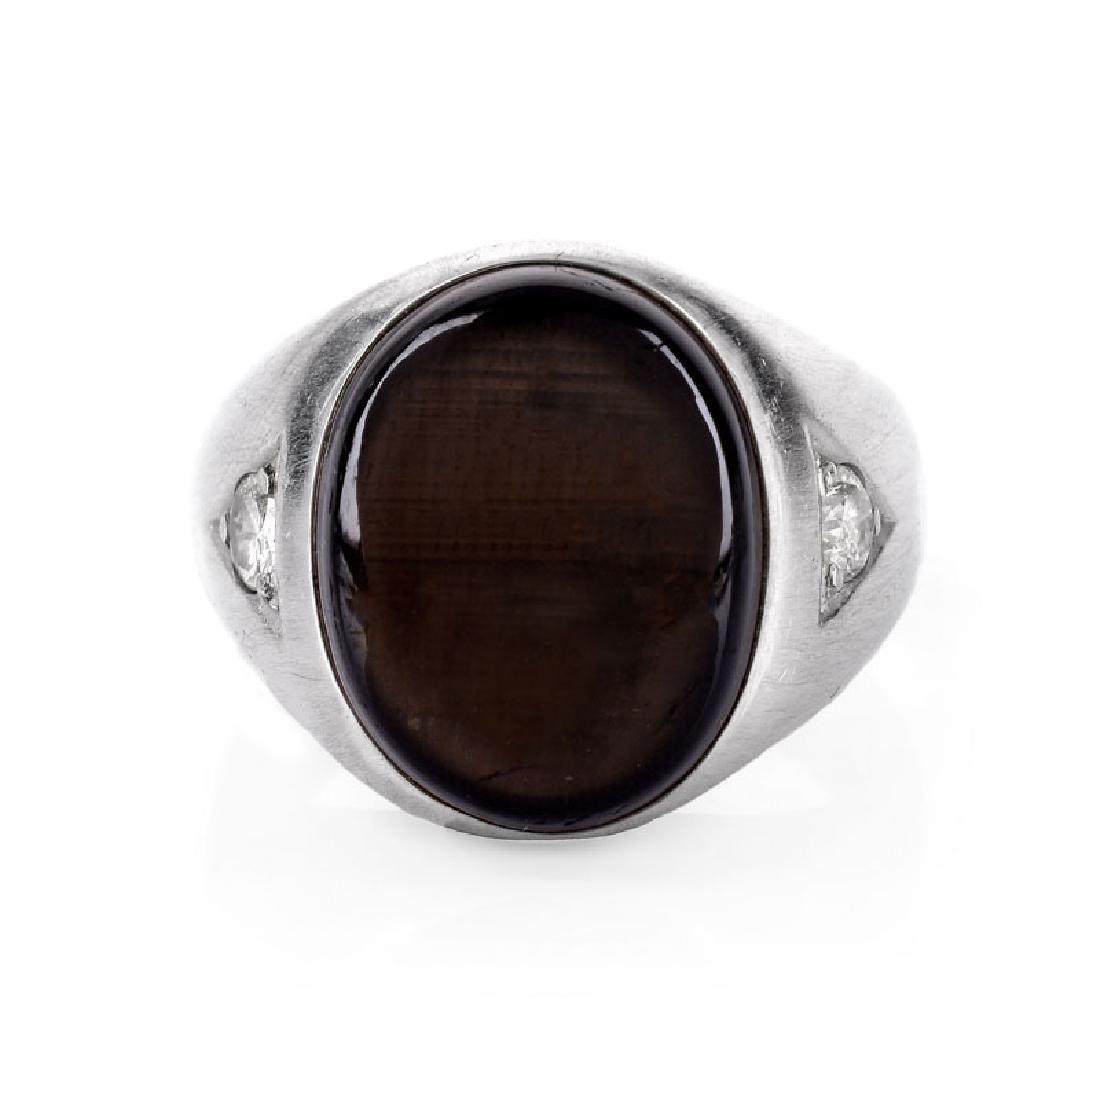 Man's Vintage Approx. 12.0 Carat Black Star Sapphire,